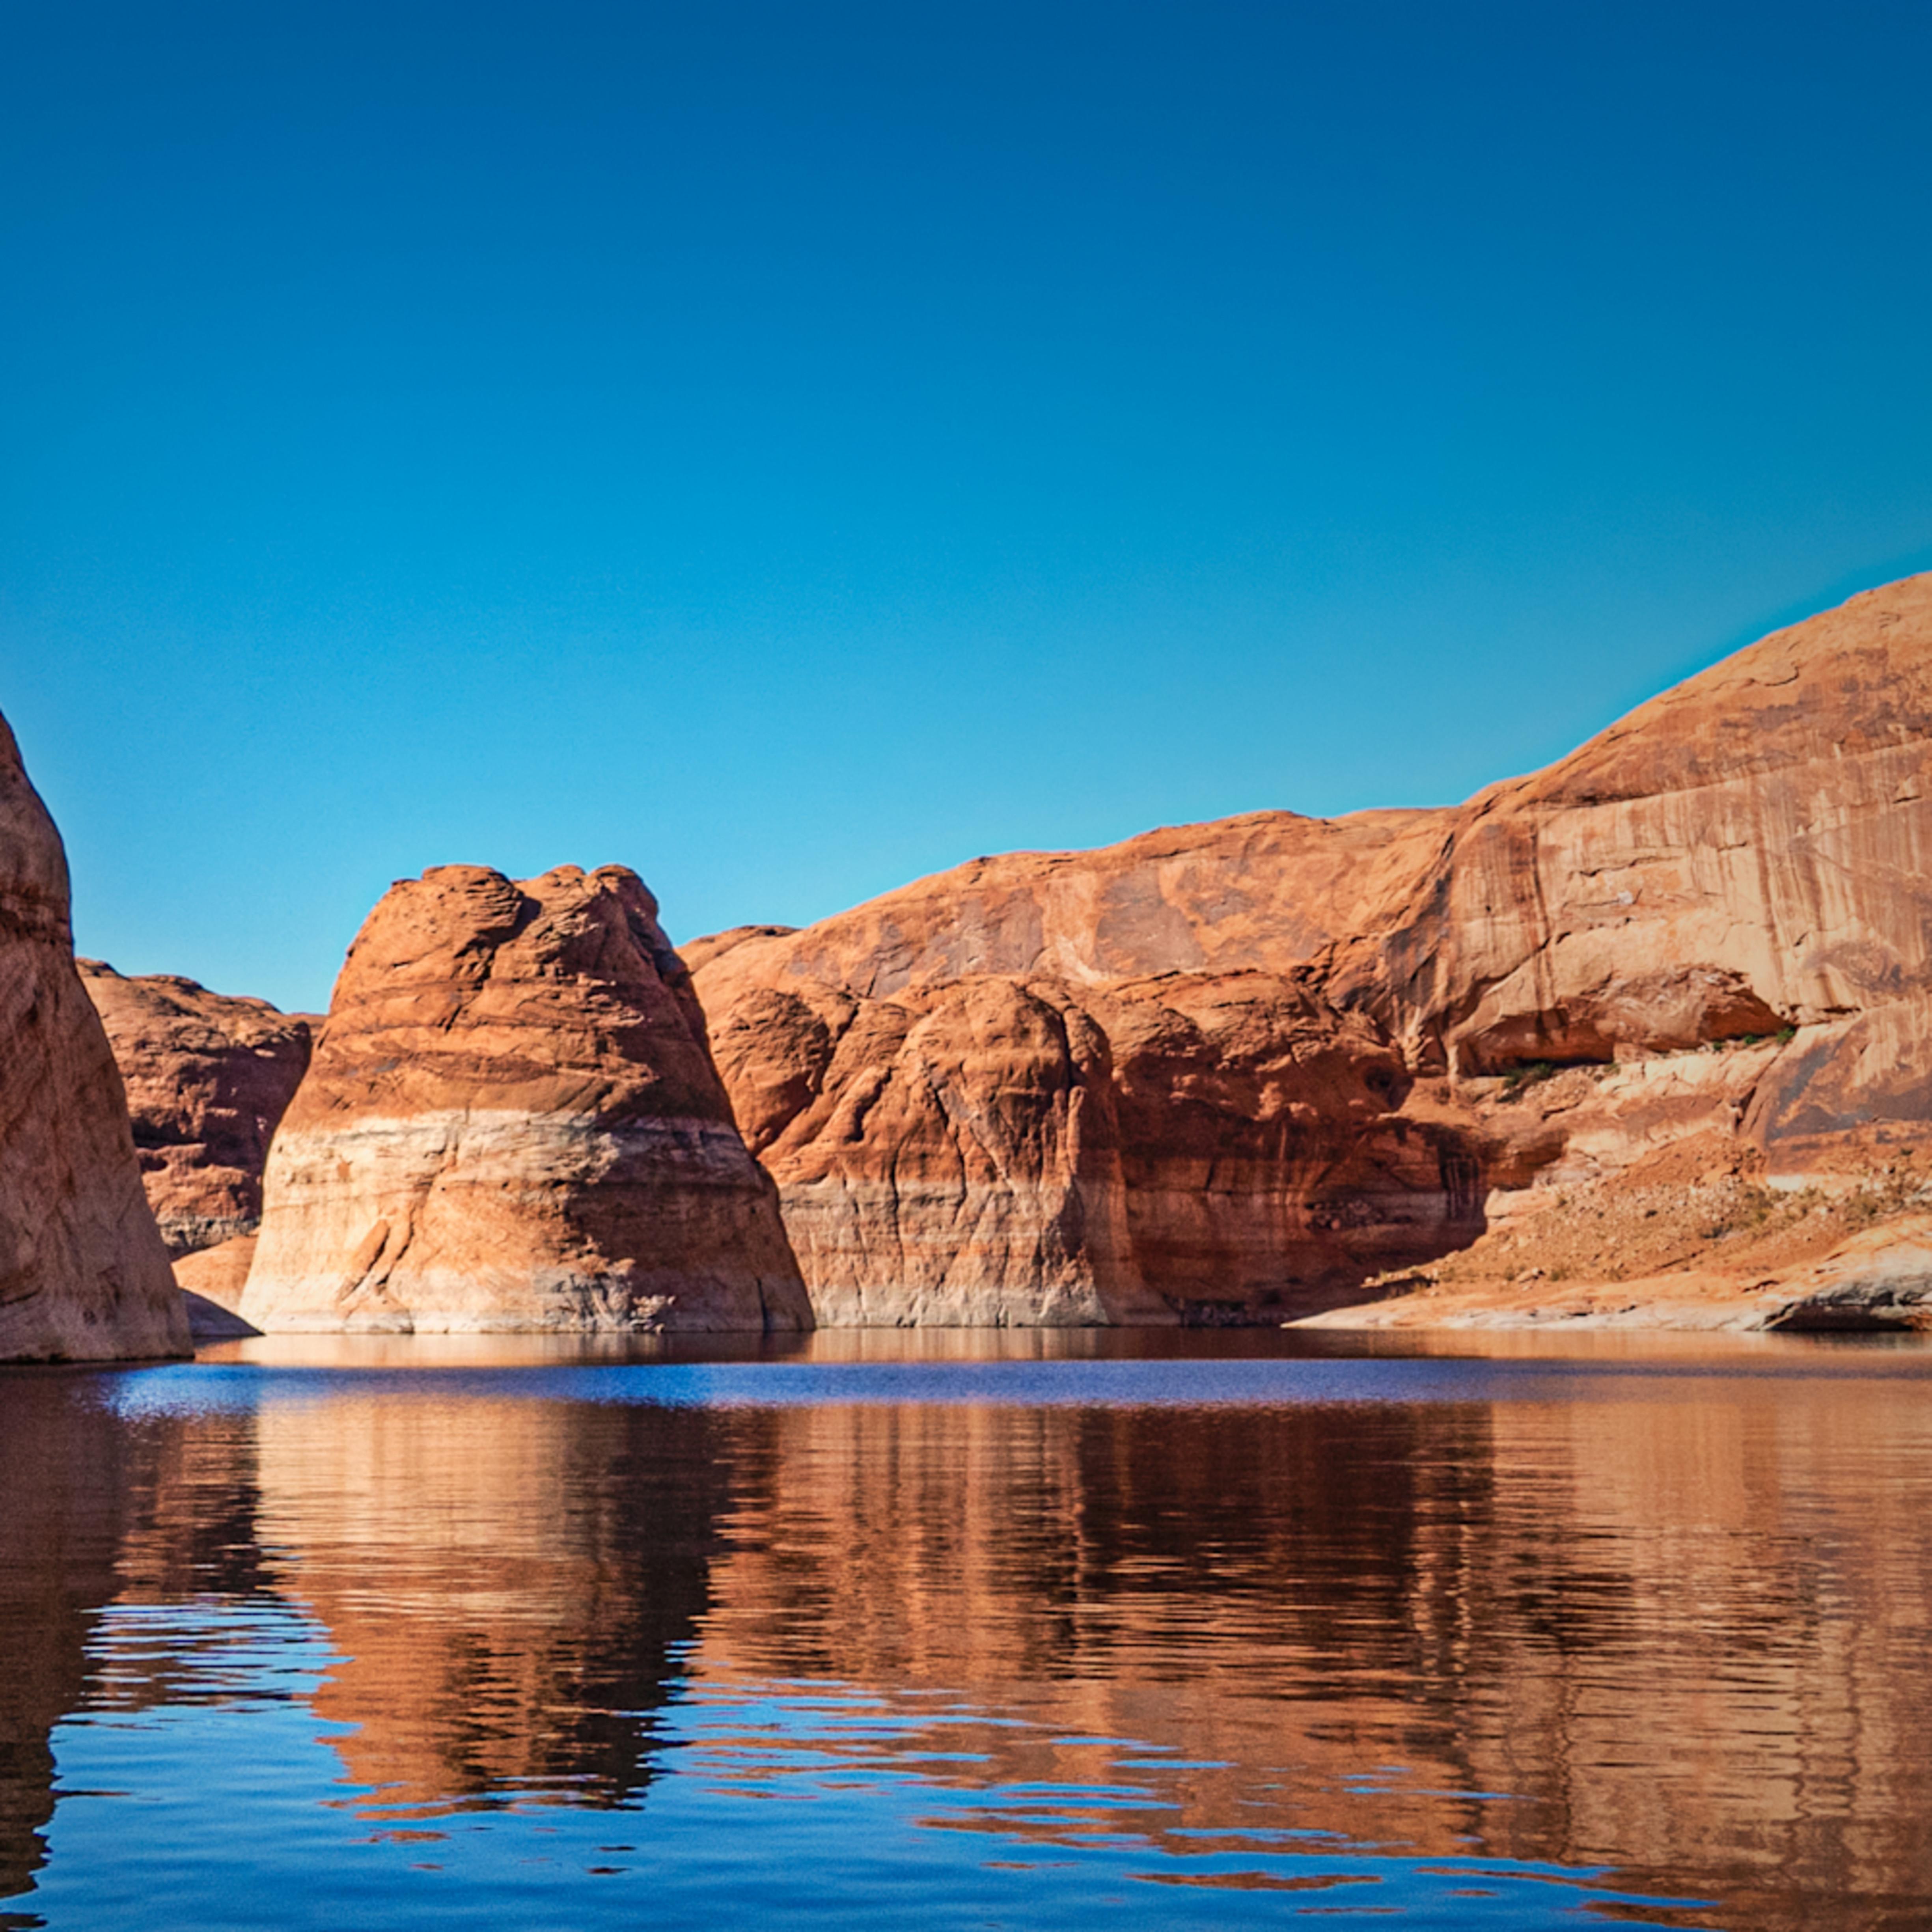 Lakepowellreflections x8l4bh